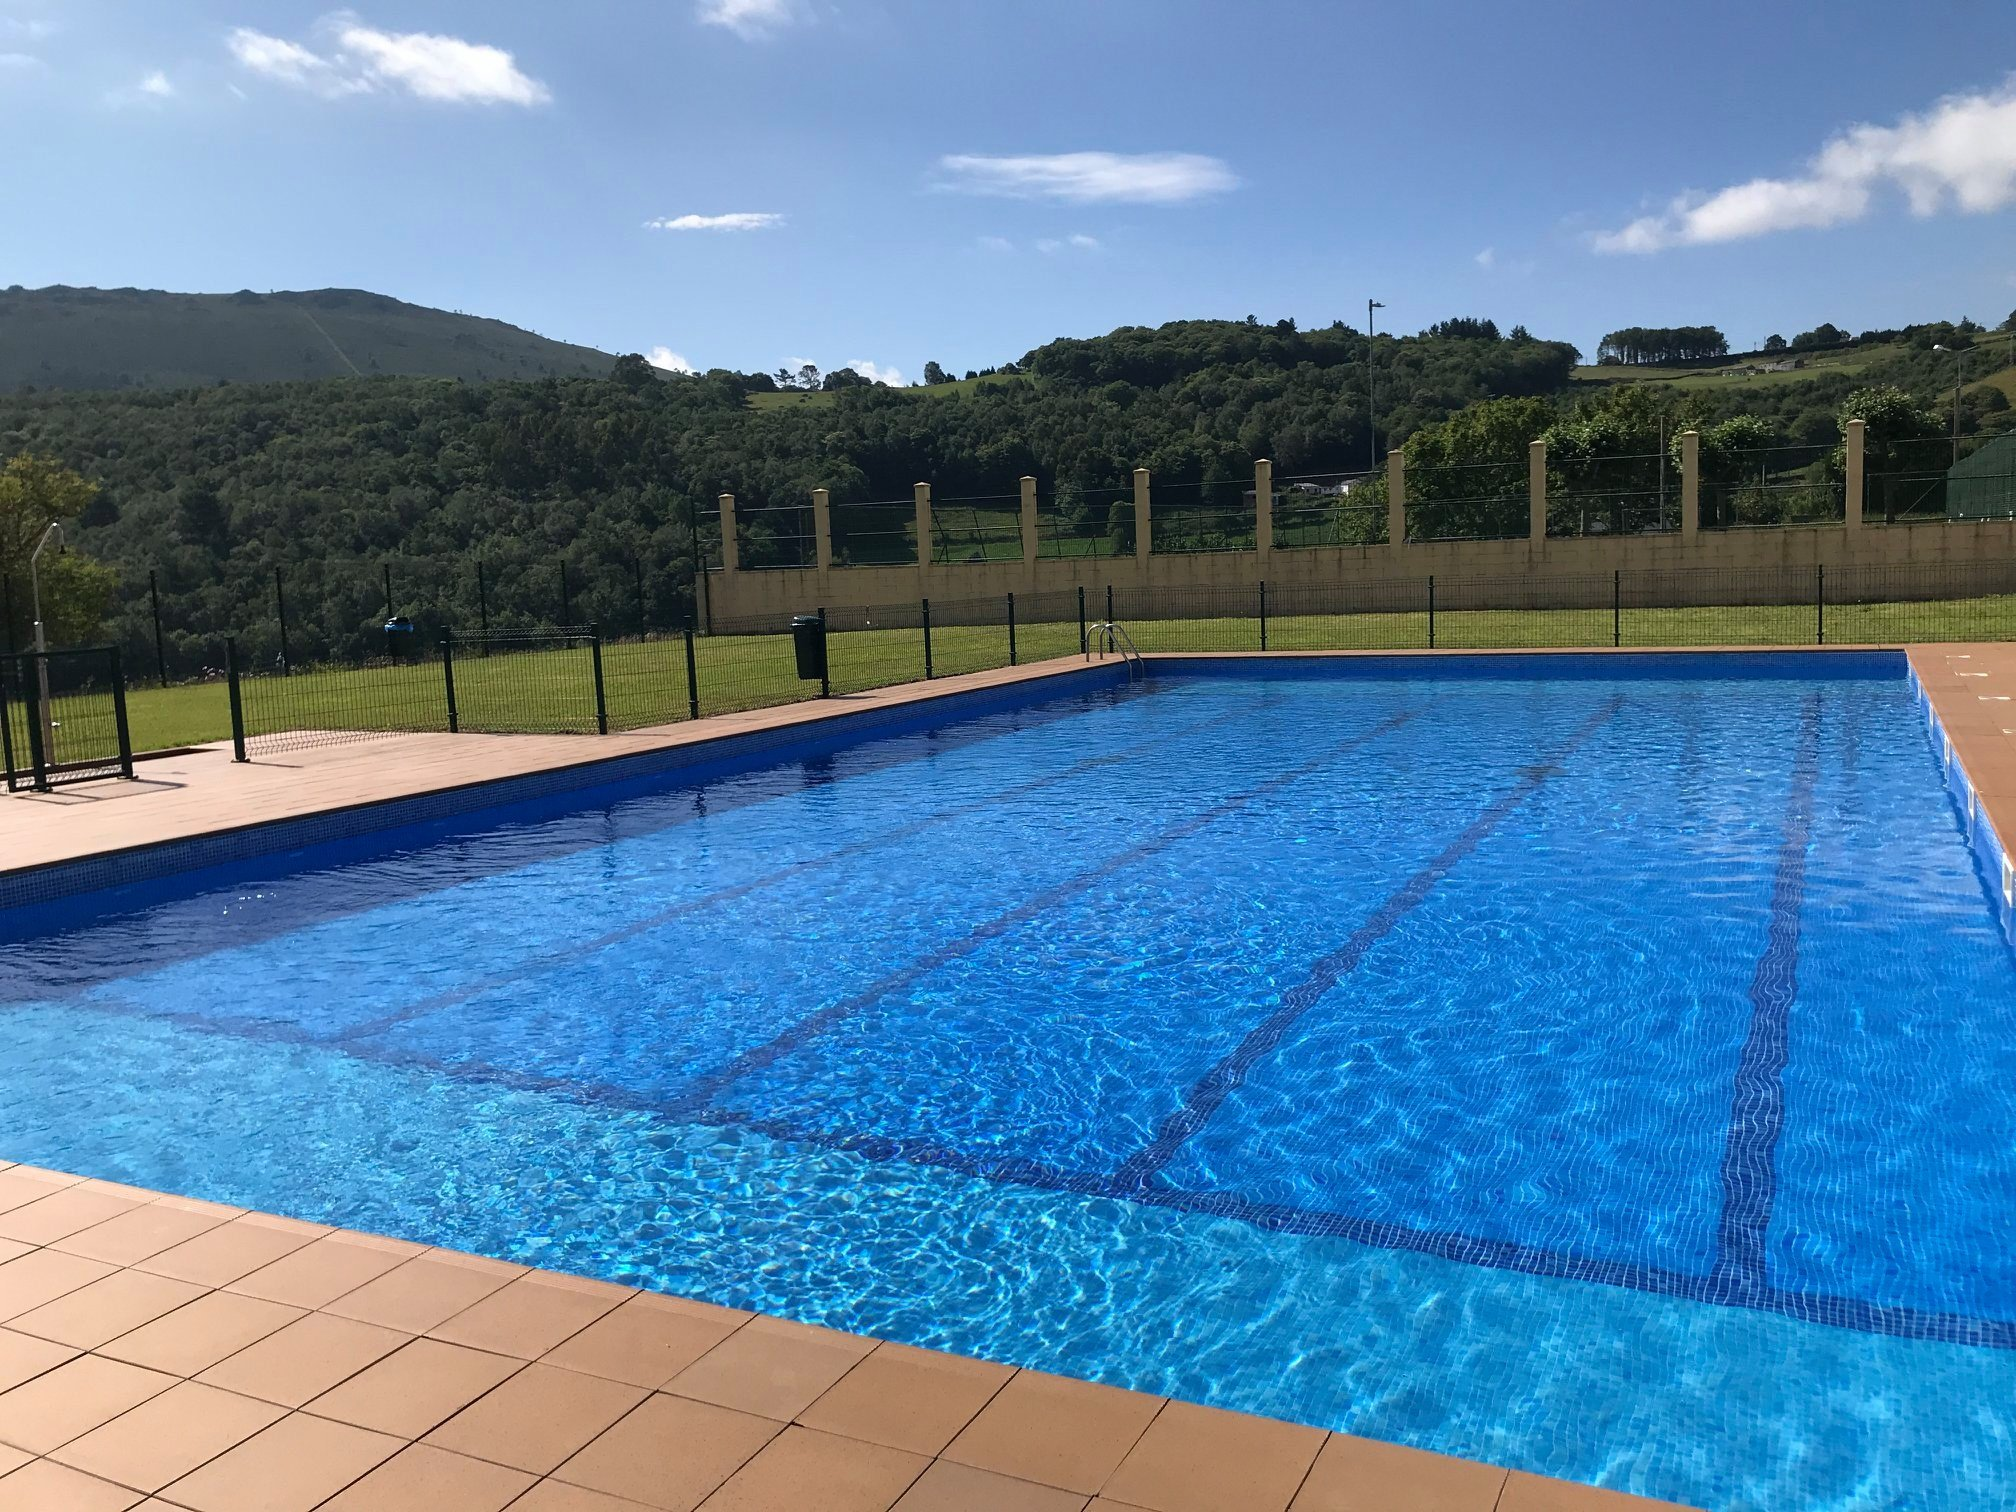 Este miércoles se abre al público la piscina municipal de Boal